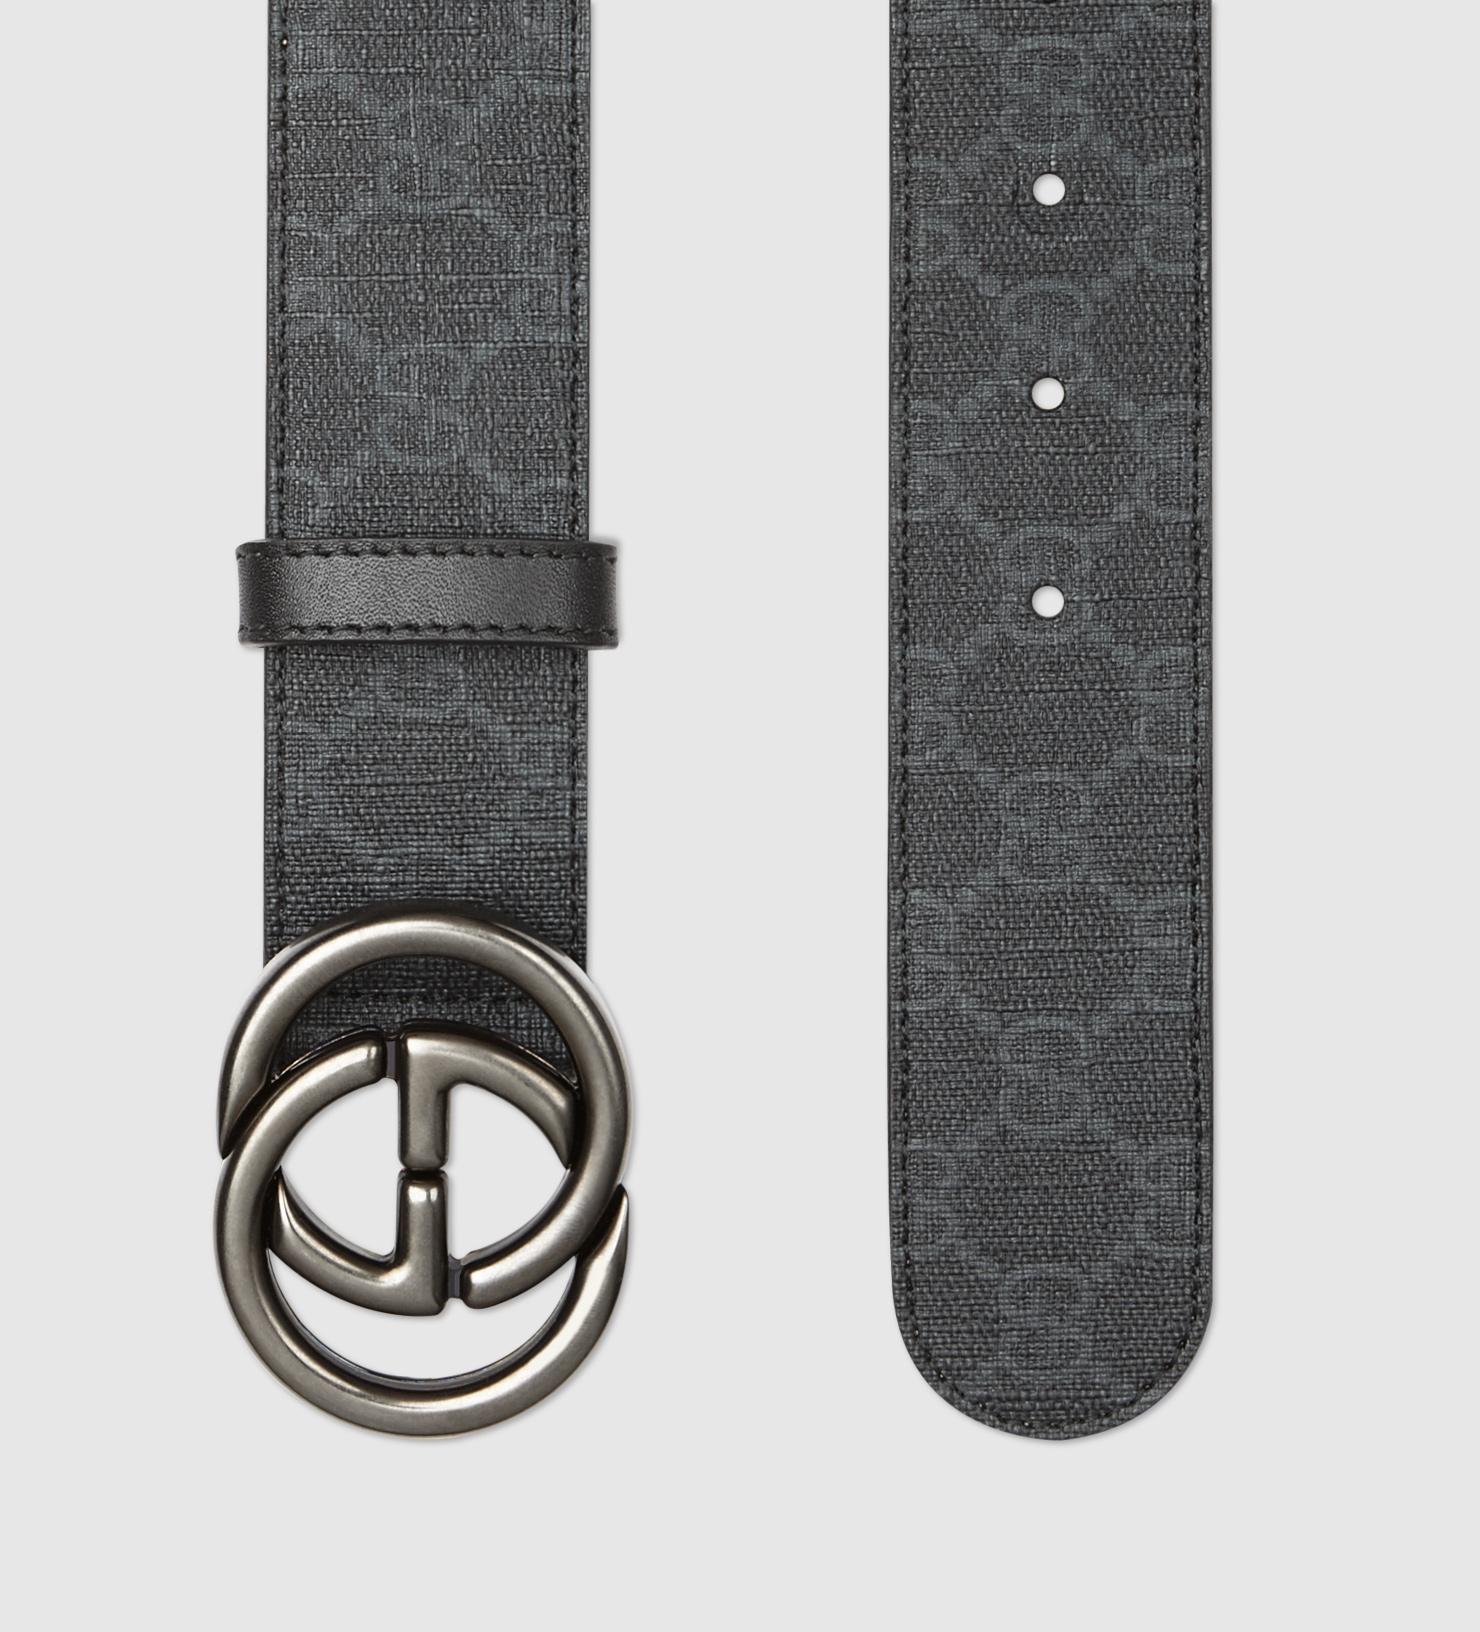 e9706f522d13 Lyst - Gucci Gg Supreme Canvas Belt With Interlocking G Buckle in ...